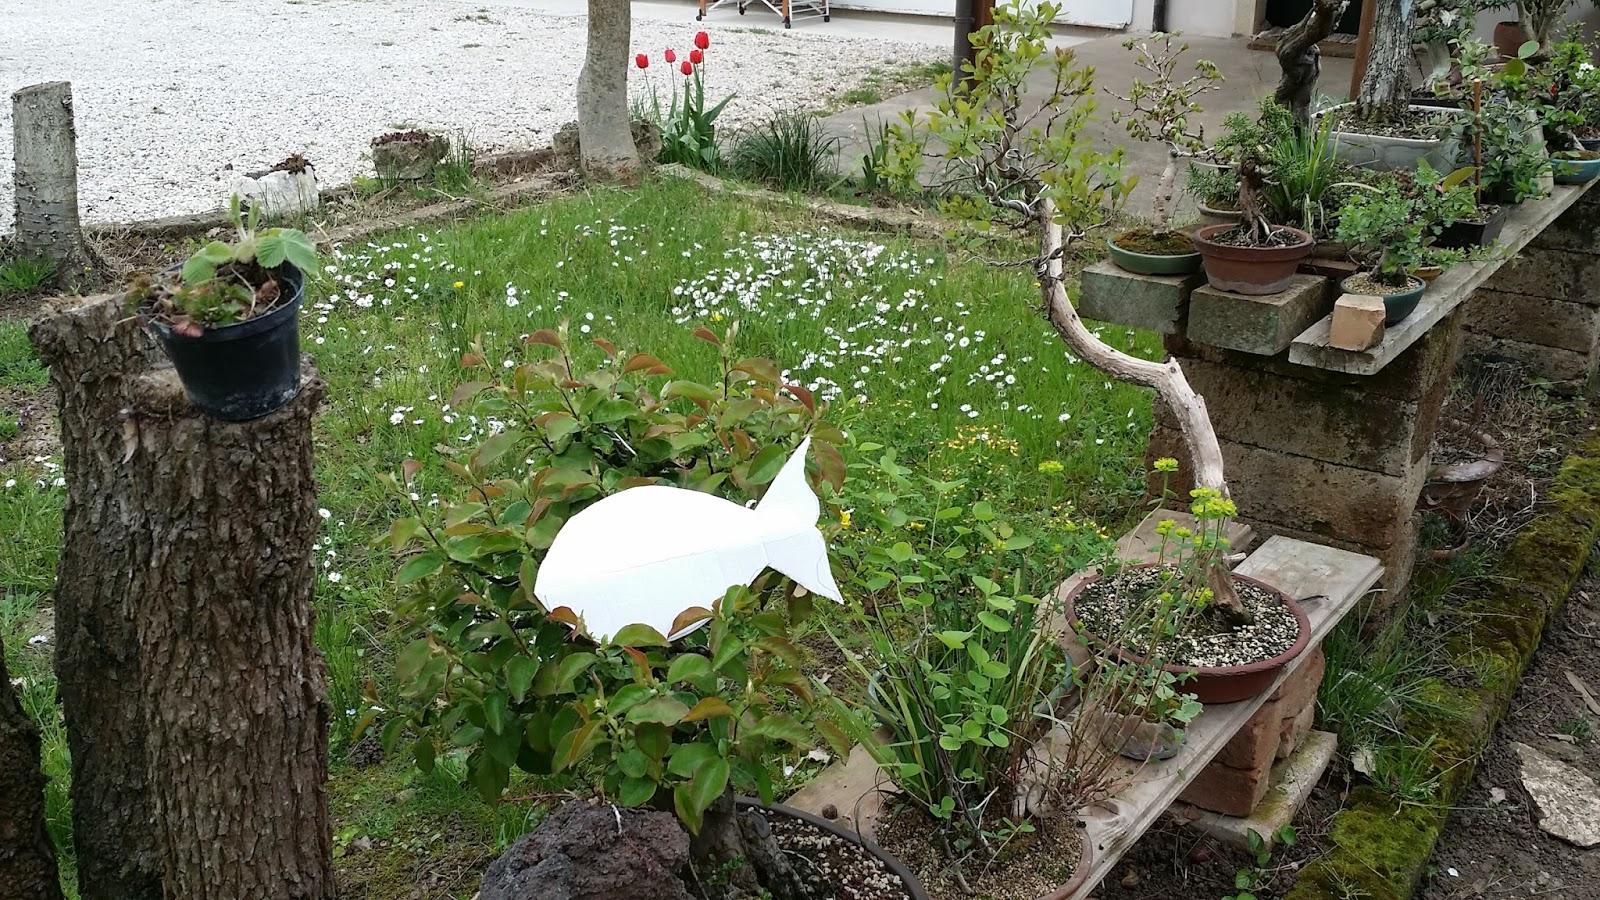 Giorgitudini poissons dans le jardin for Bricoler dans le jardin